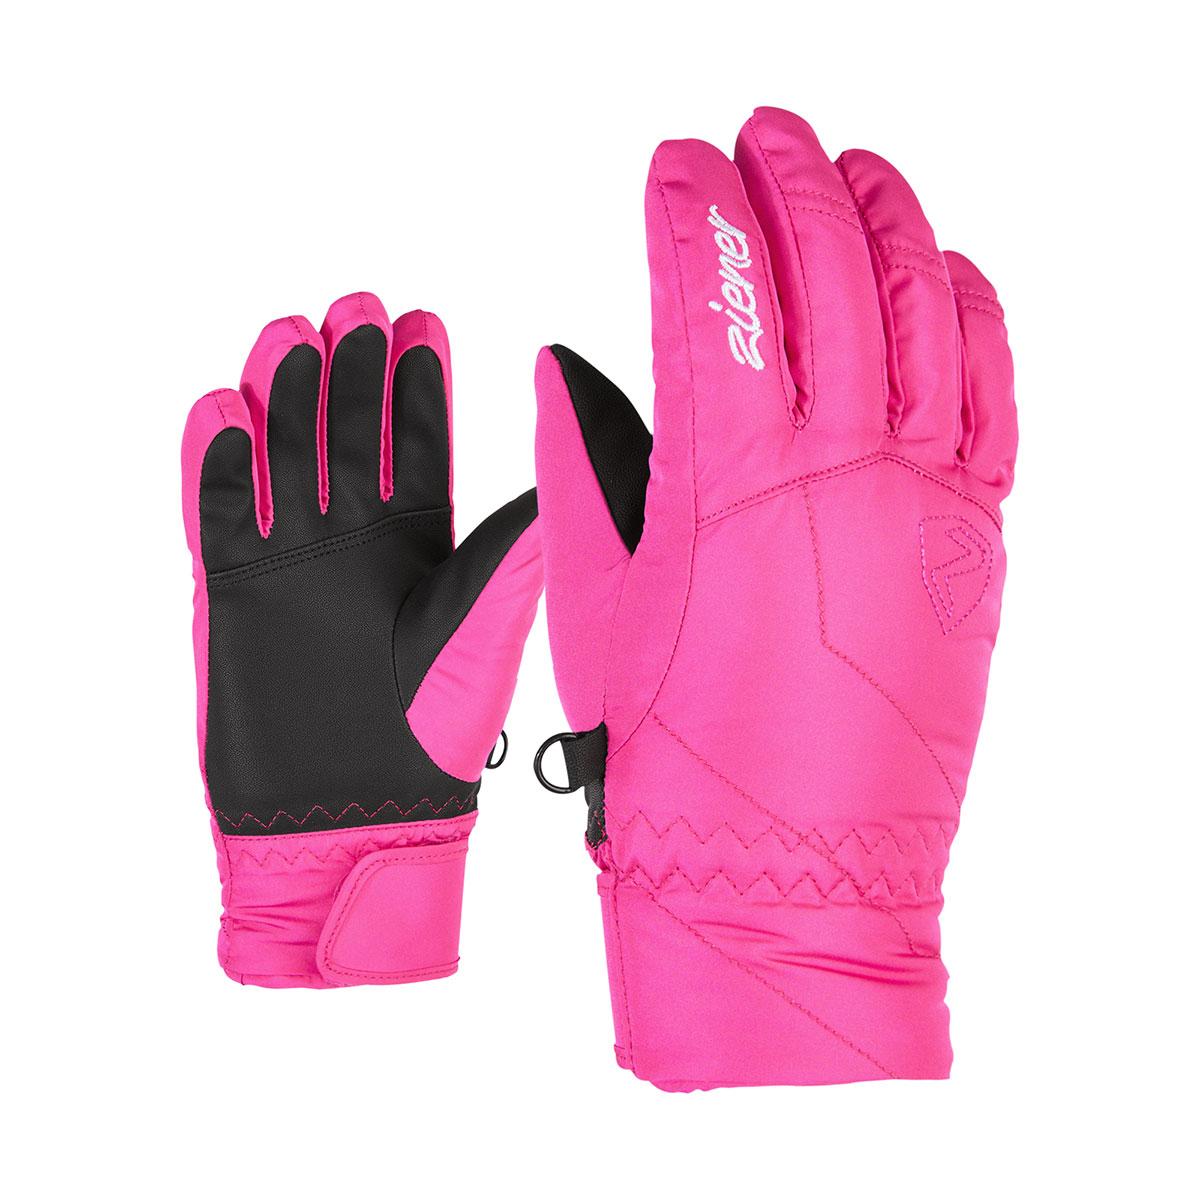 Ziener M/ädchen Handschuhe Agilo As R Gloves Junior Skihandschuh